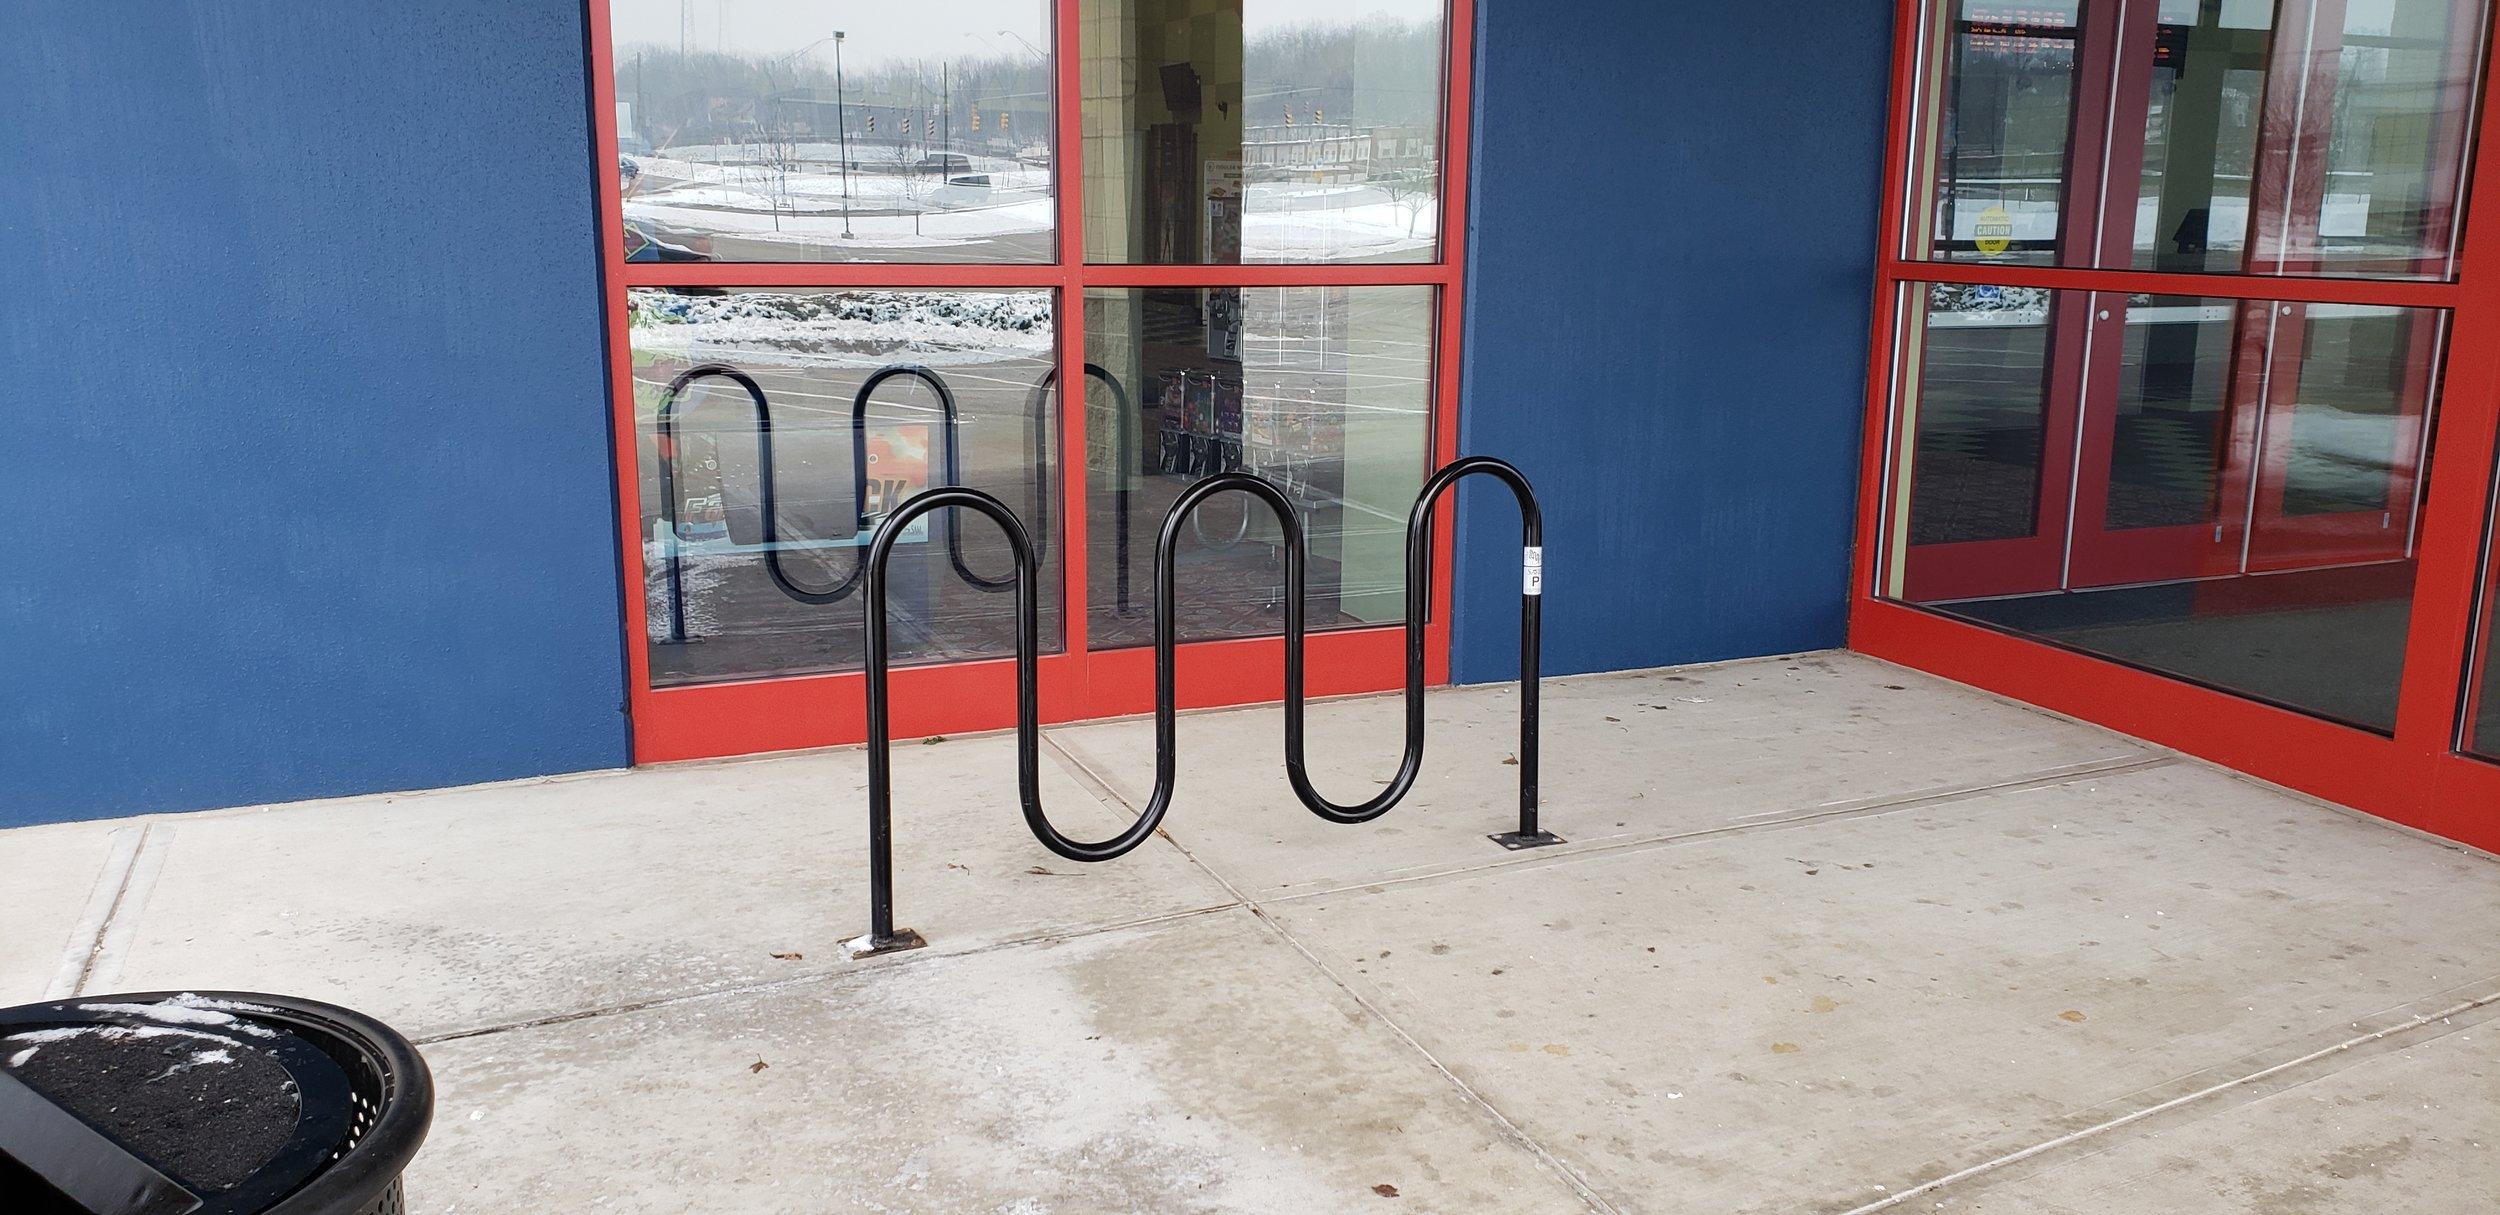 ROW 17 - Bike Rack - Regal Massillon Movie Theater.jpg